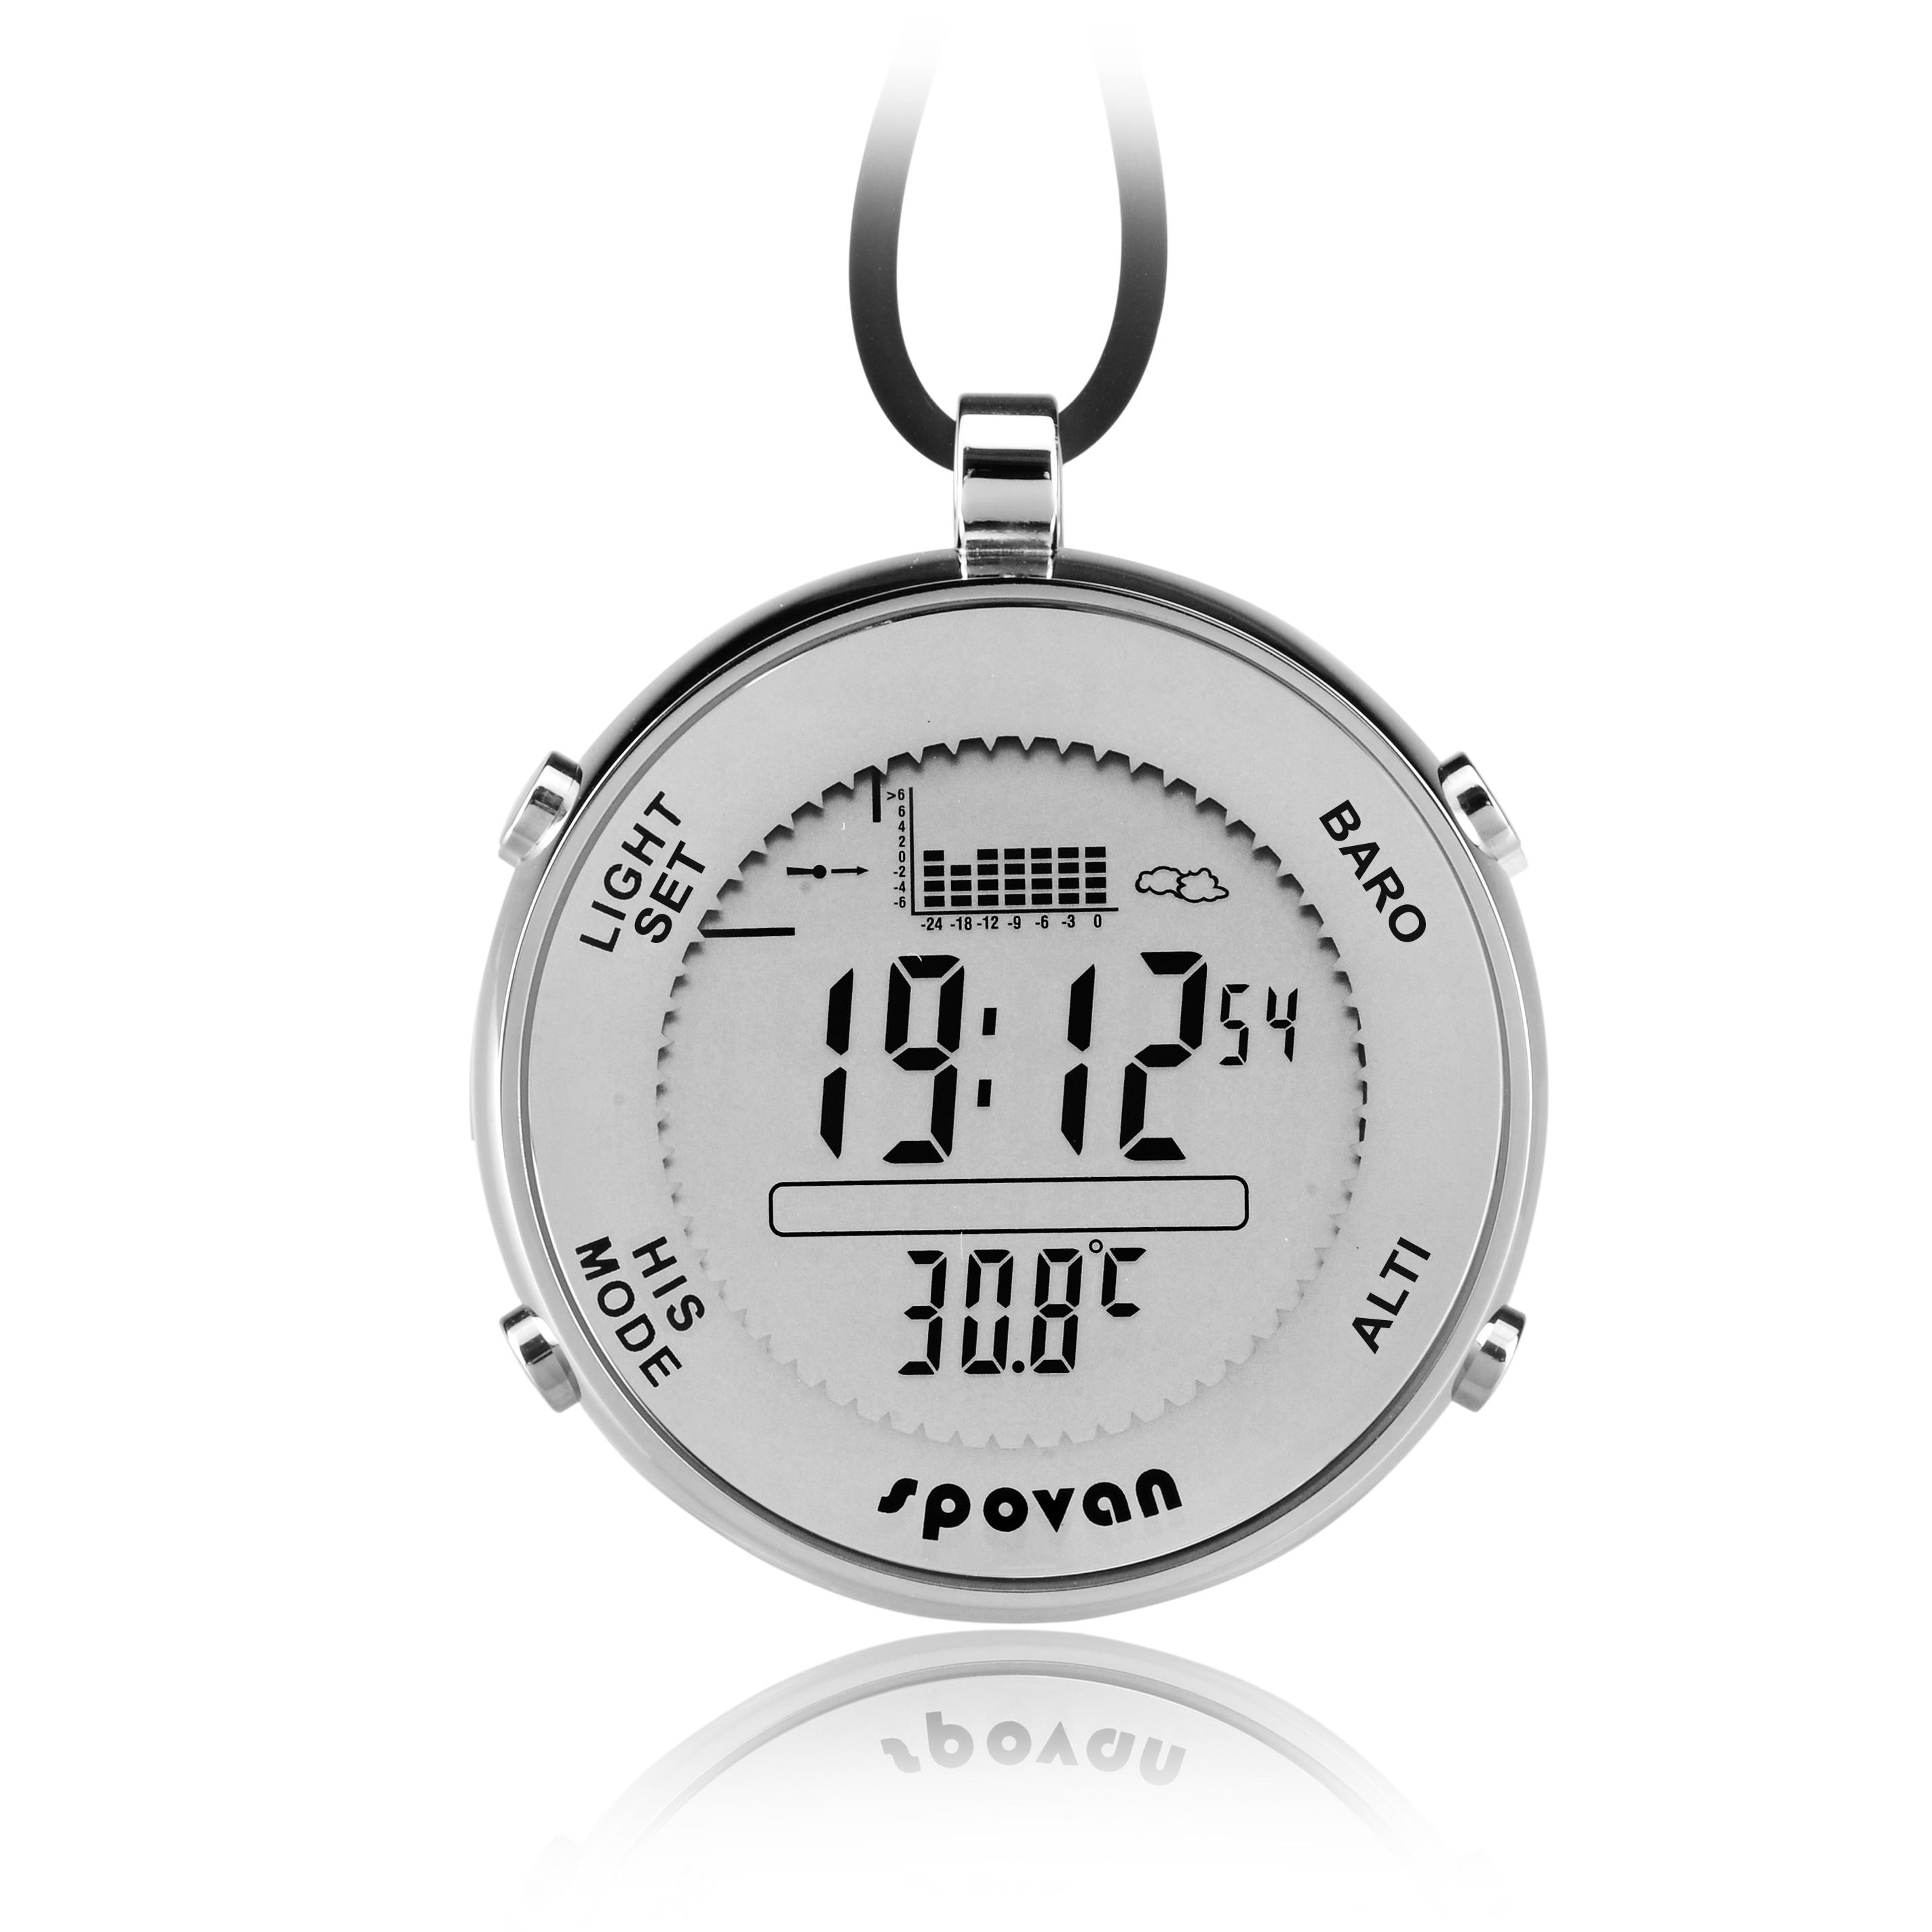 dl-o03 Digital Watches Multifunction Waterproof Spovan Watch Altimeter Compass Stopwatch Fishing Barometer Outdoor Sports Watch